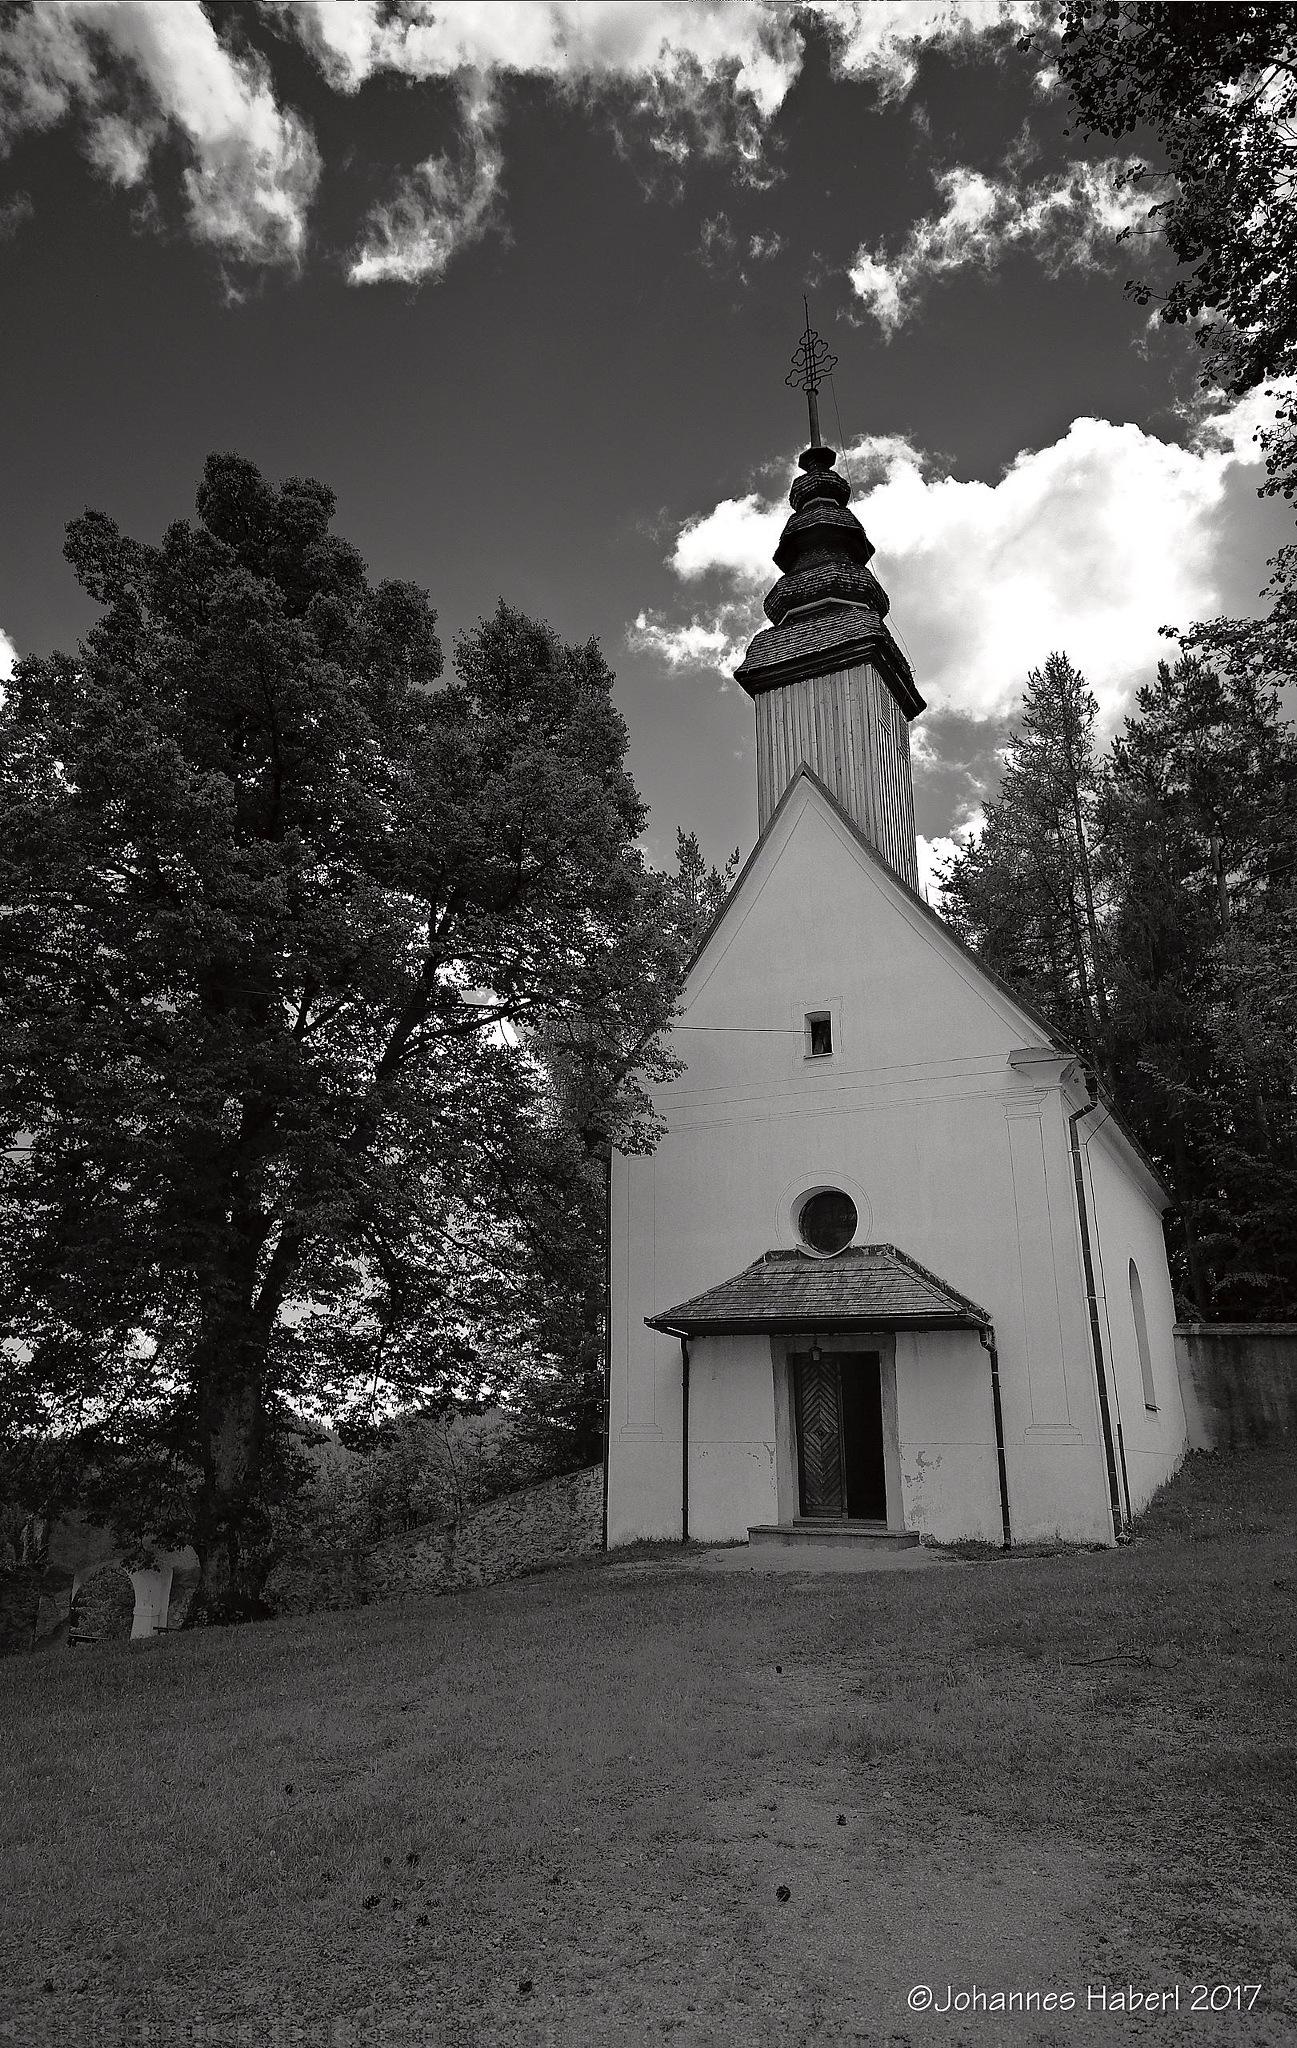 Sveti Duh - chapel in the courtyard / B&W by Johannes Haberl